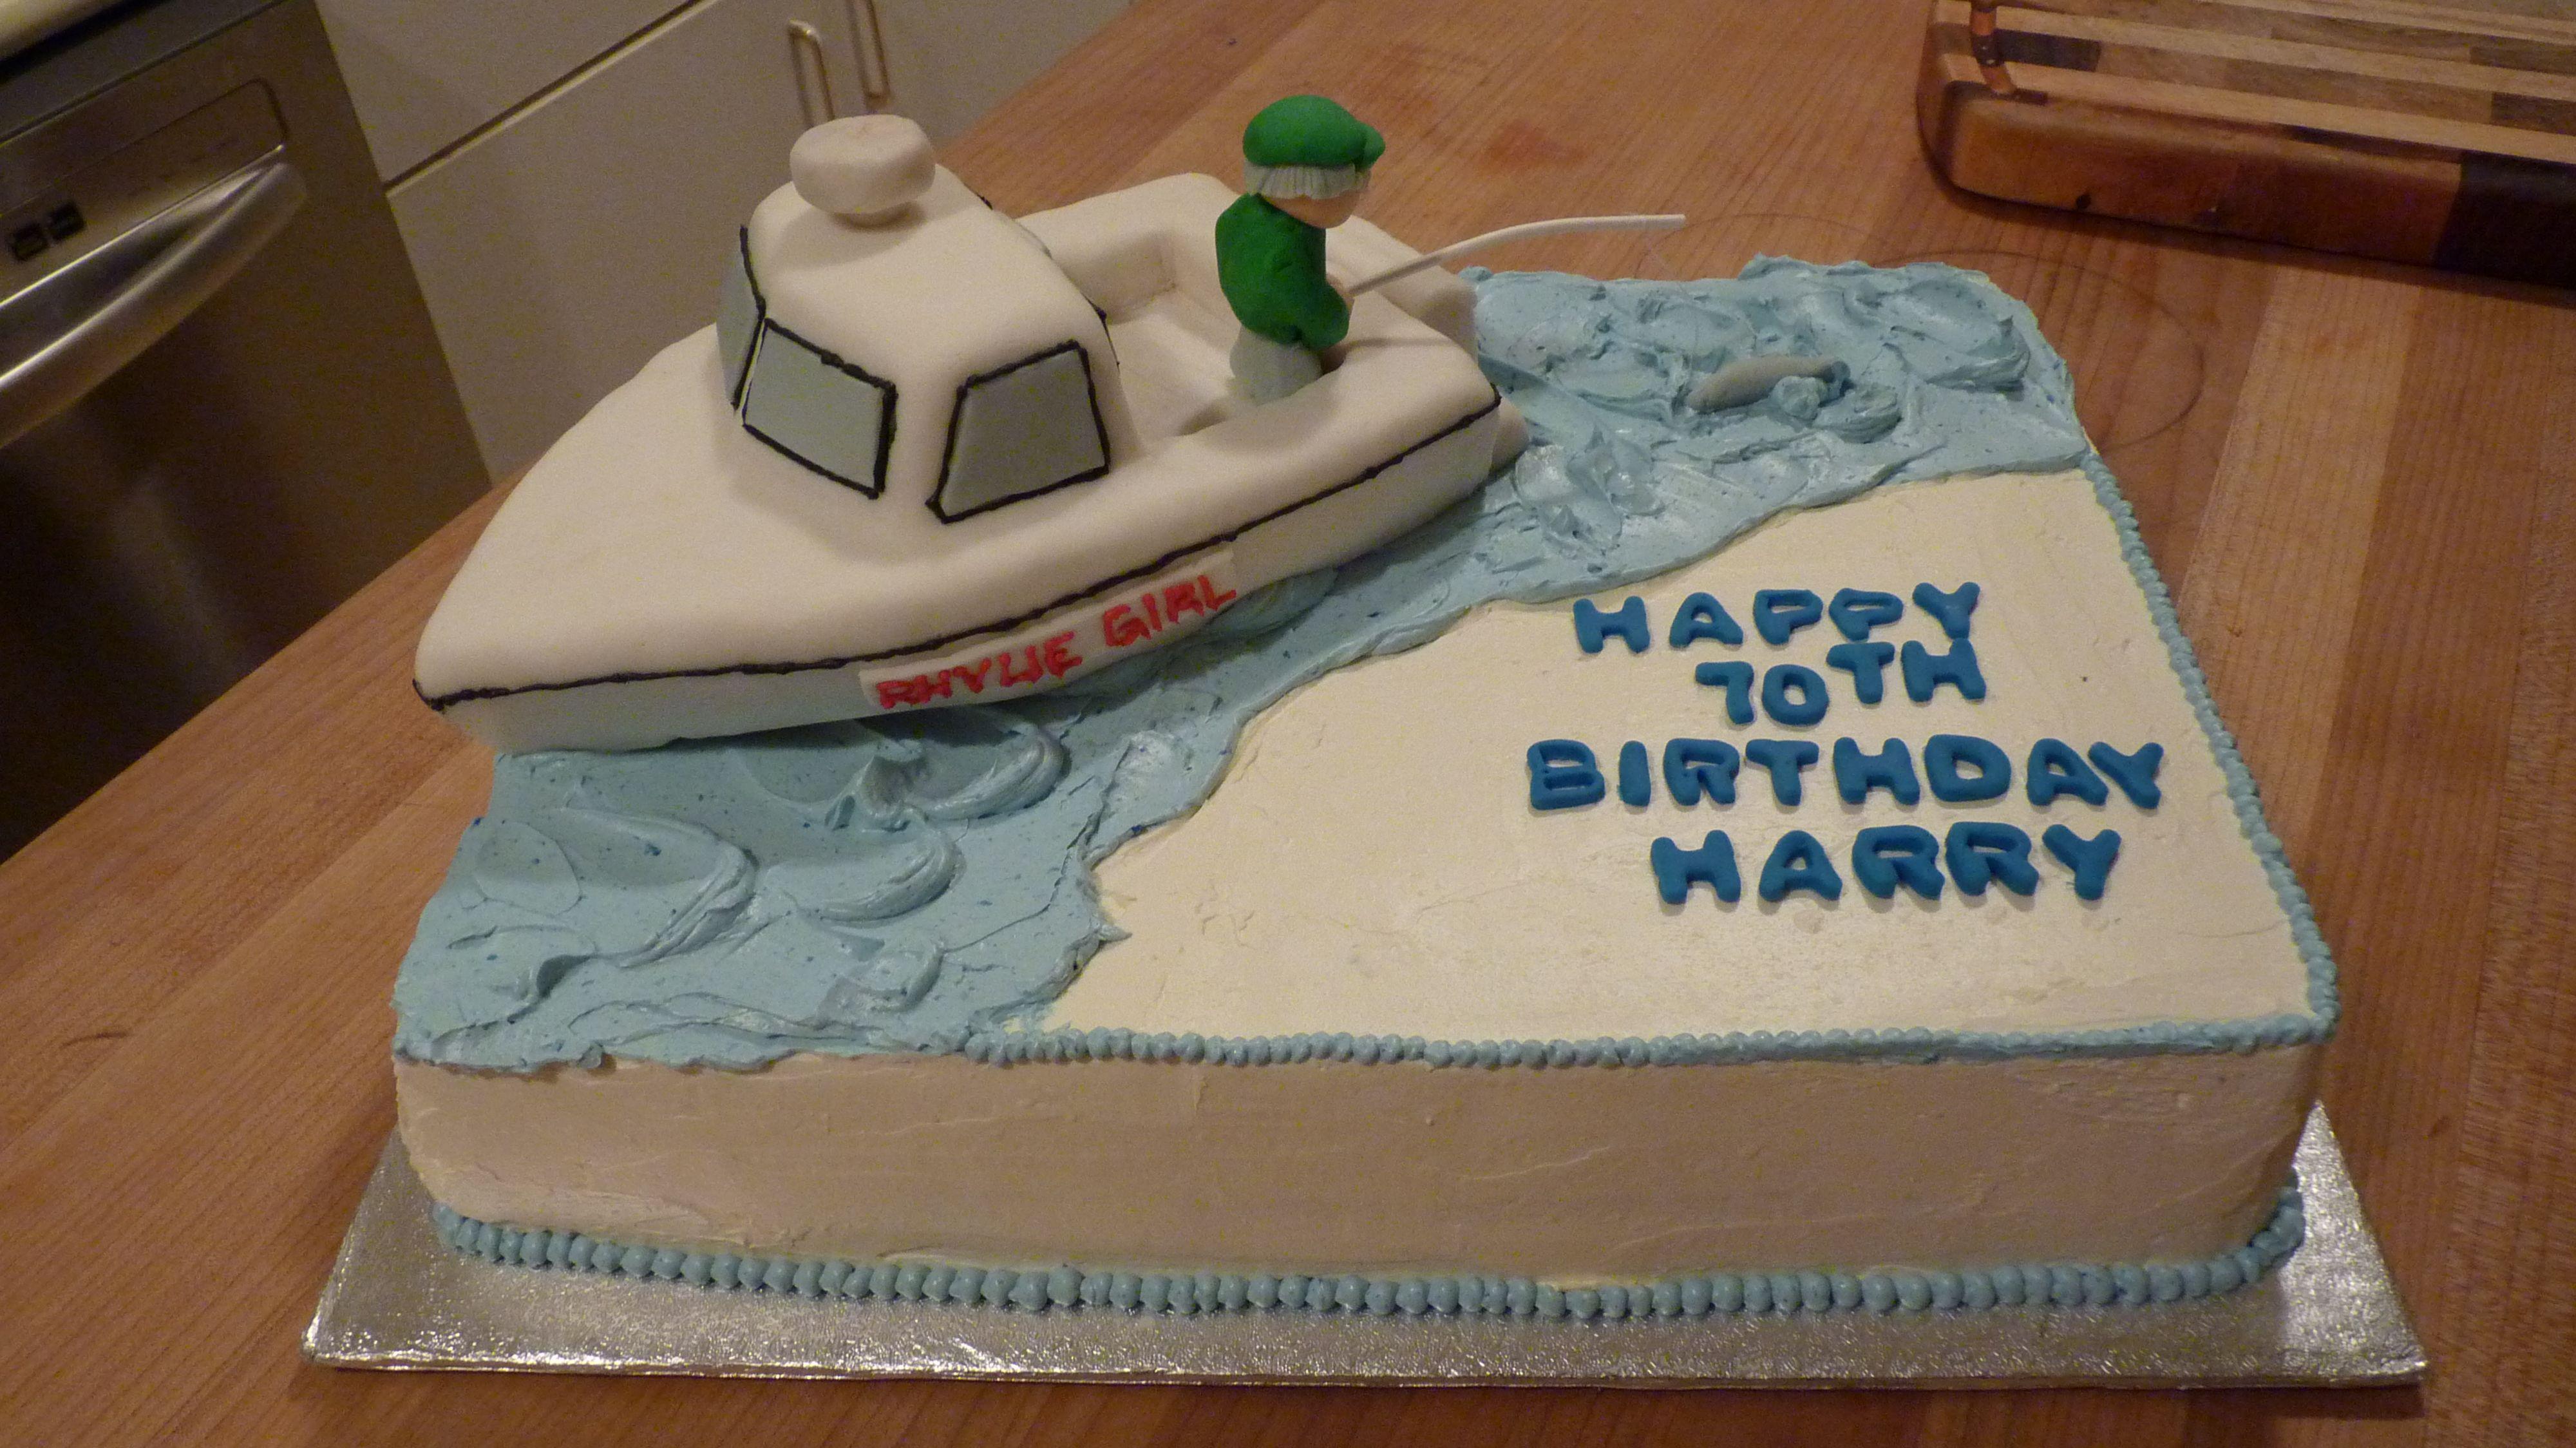 Pin By Cheryl Ellis On Cake Decorating Ideas Cute Birthday Cakes Fish Cake Birthday Grooms Cake Fishing